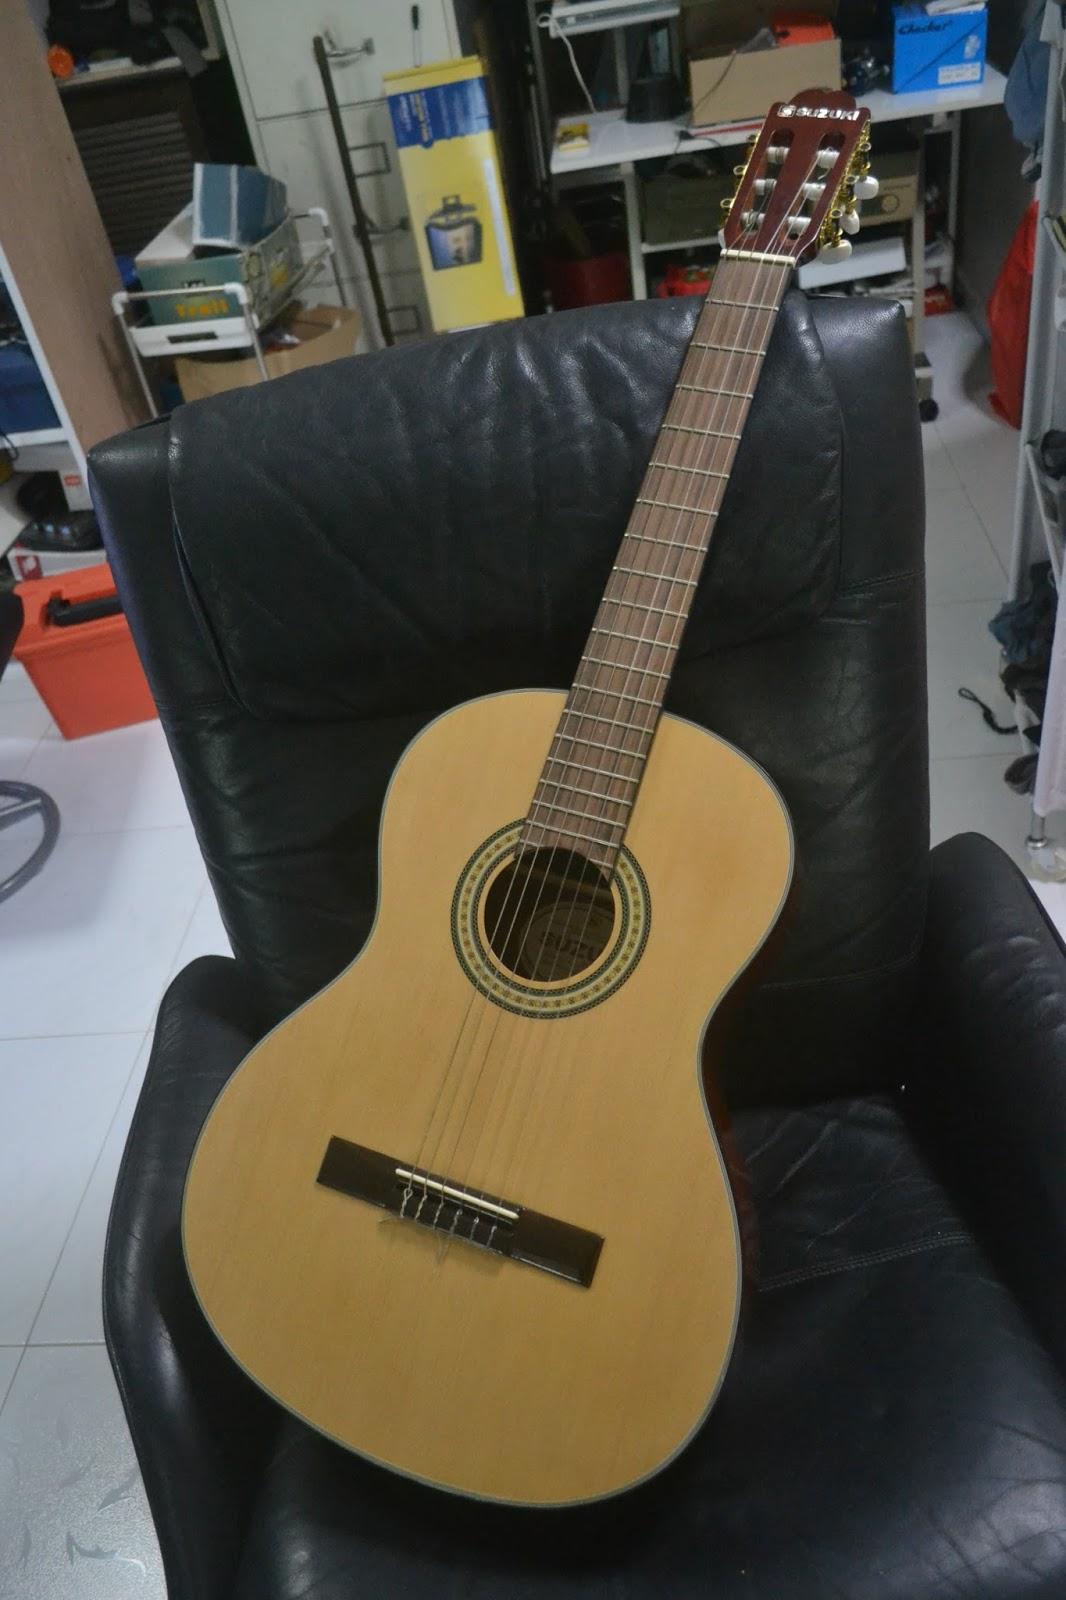 joiesoul suzuki classical guitar for sale. Black Bedroom Furniture Sets. Home Design Ideas